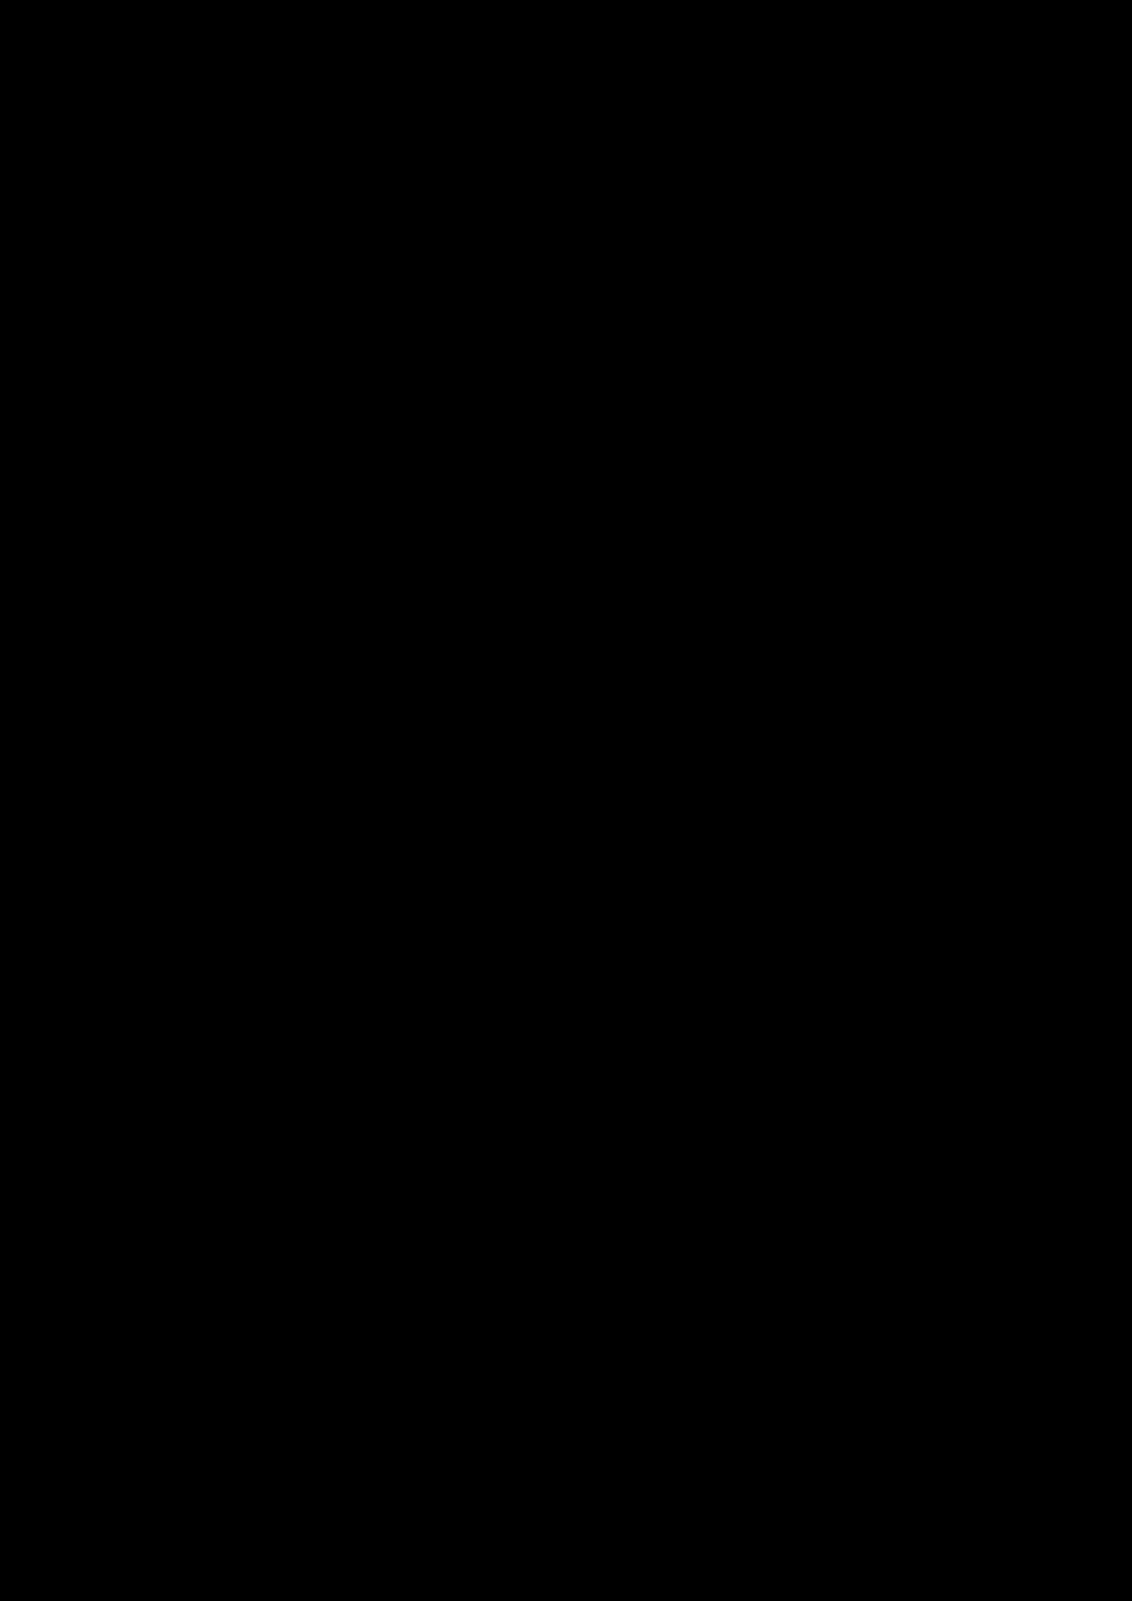 Korolevstvo slez slide, Image 65